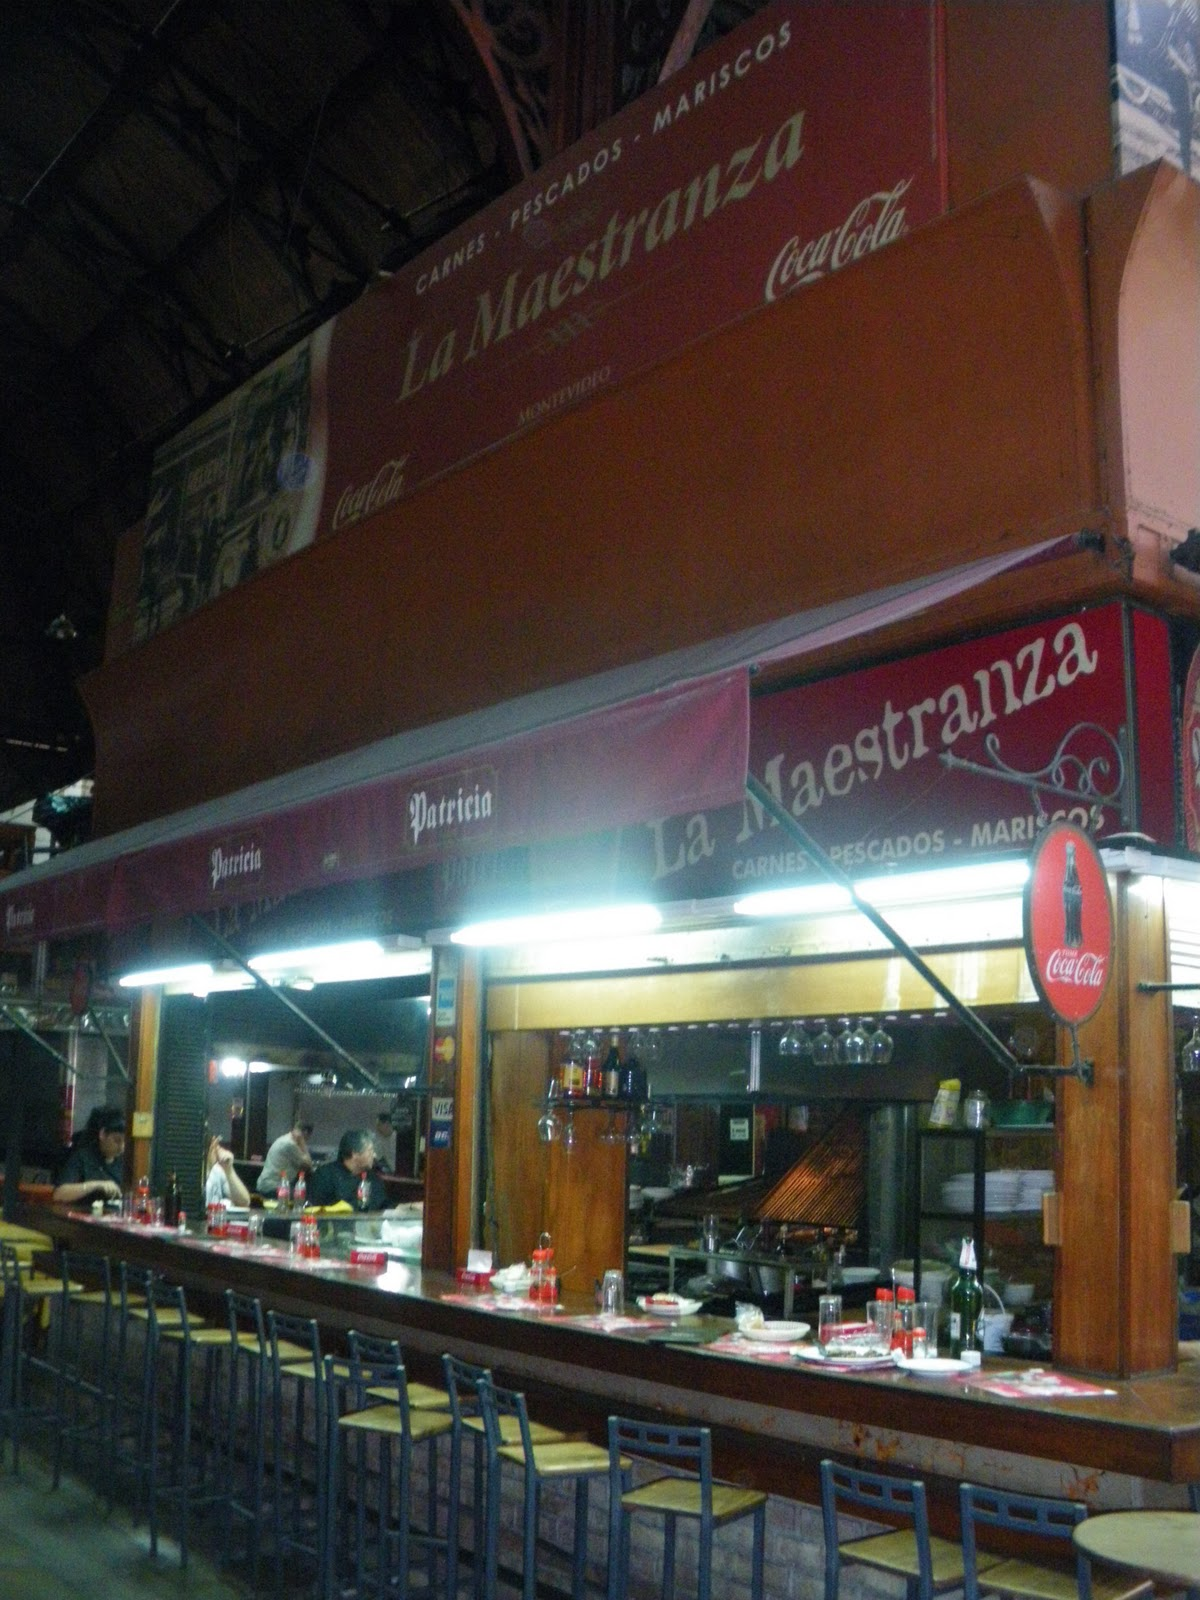 Mercado del puerto montevideo uruguay for Bar living montevideo